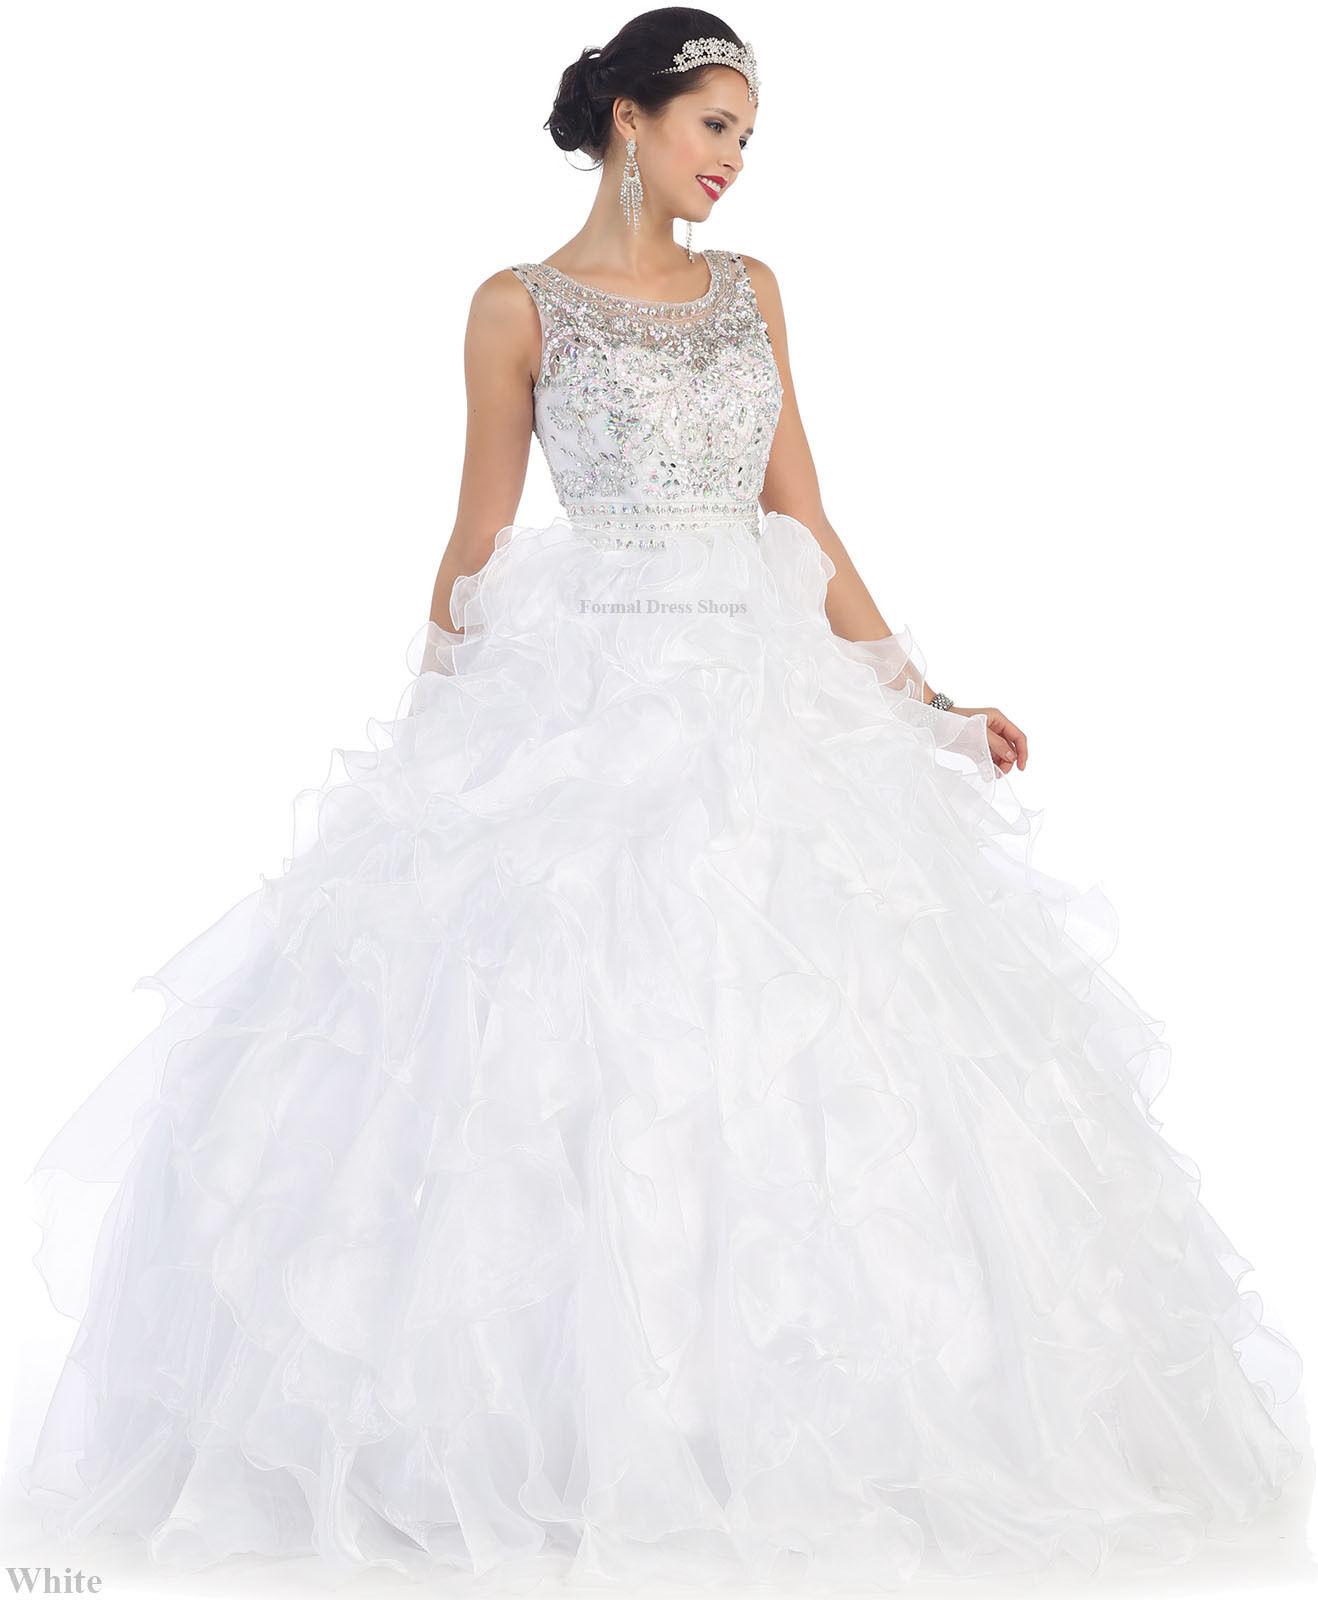 Details About Quinceanera Mardi Gras Ball Gown Debutante Princess Wedding Bridal Dress